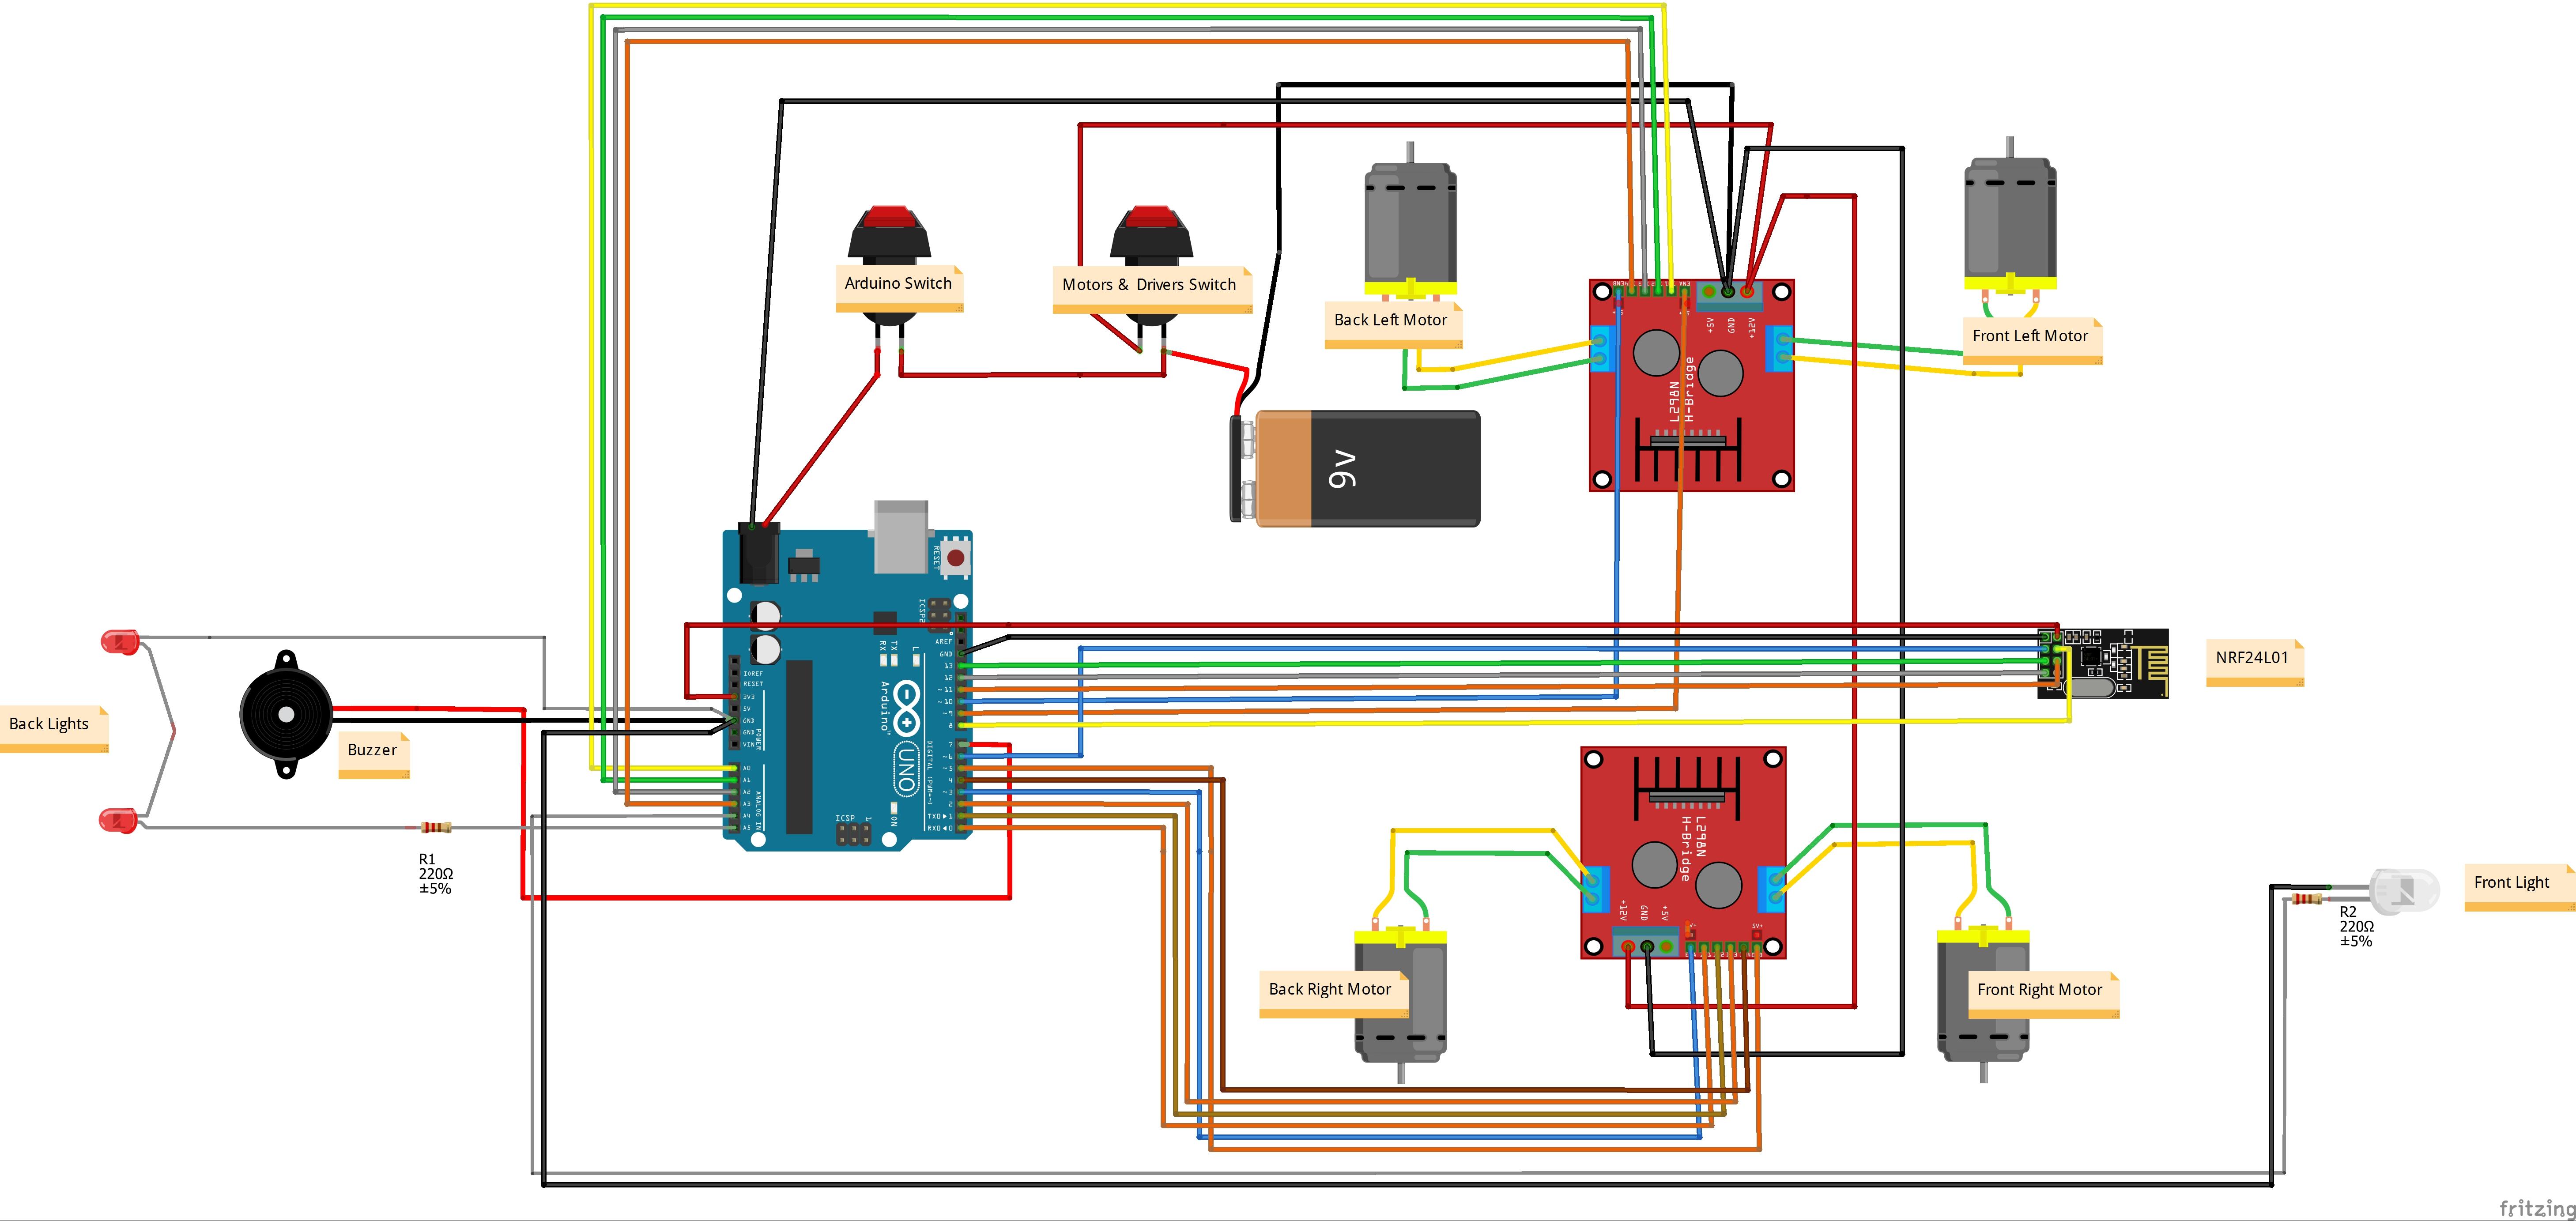 hight resolution of rc car wiring diagram wiring diagram forward wired remote control car circuit diagram rc car gas